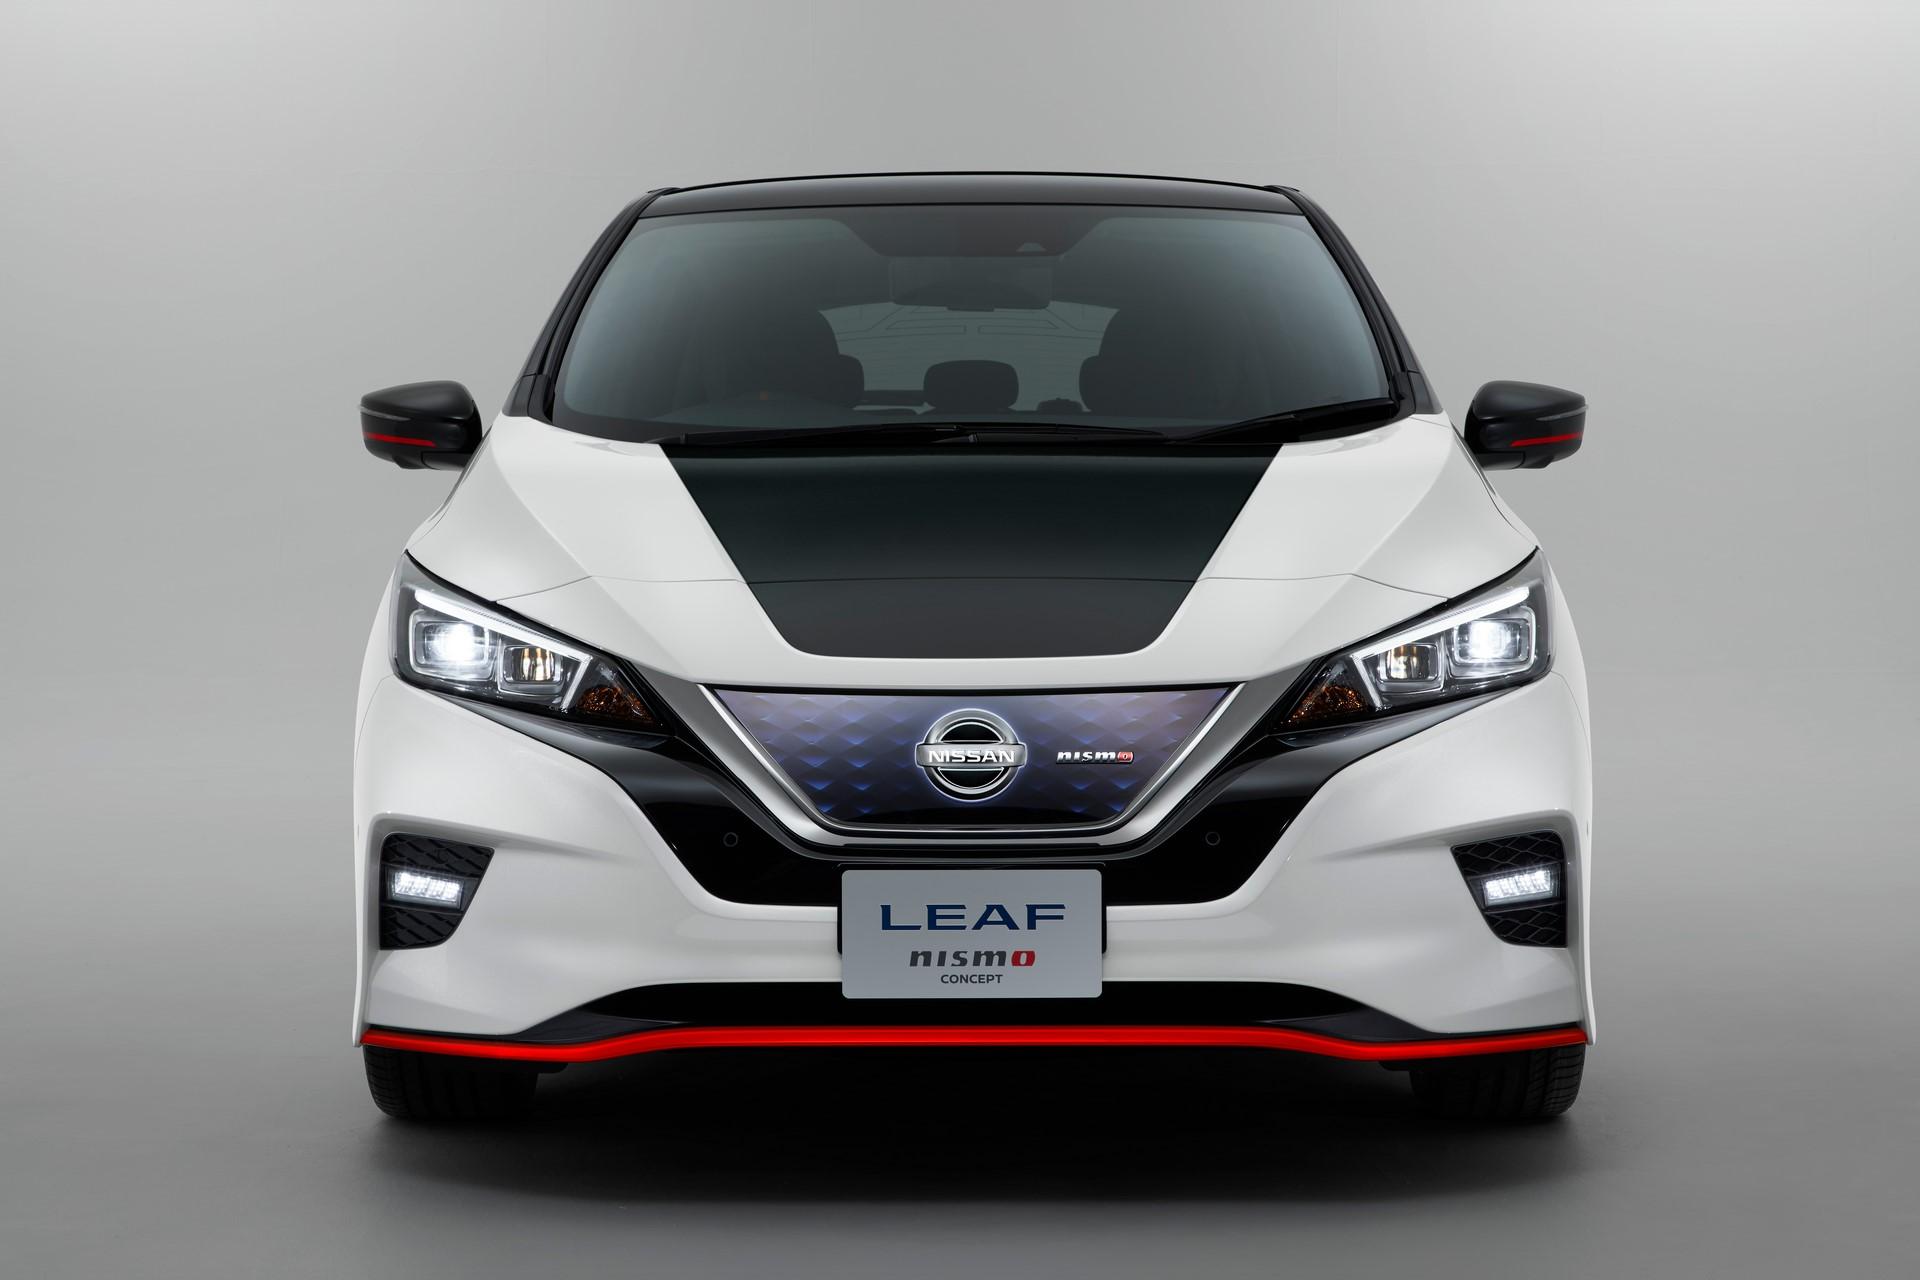 Nissan Leaf Nismo Concep (5)